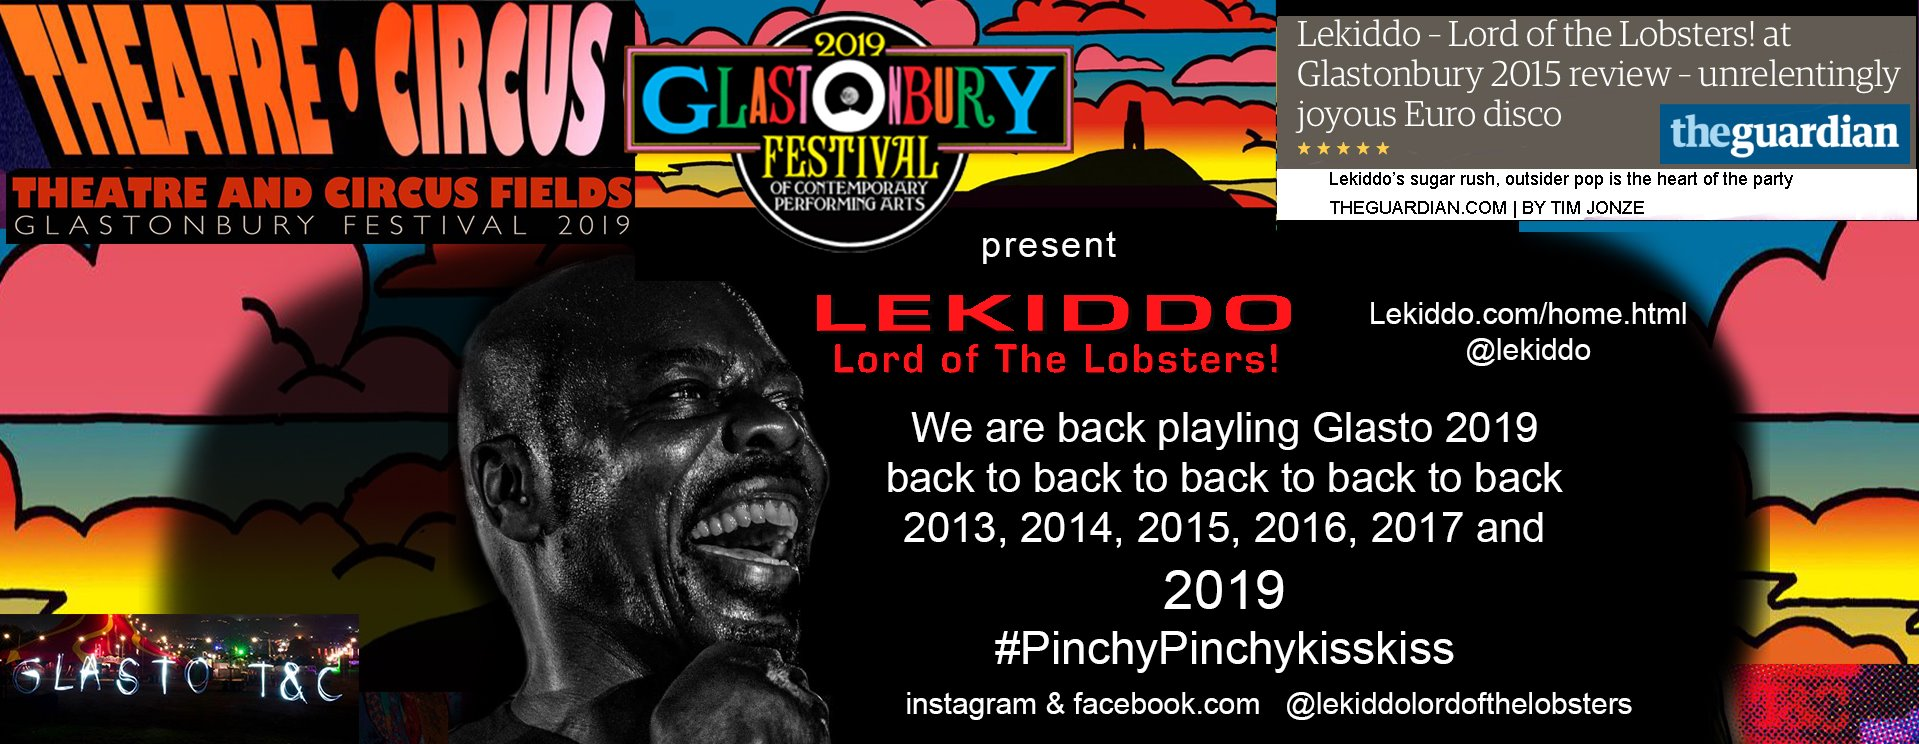 LEKIDDO - Lord of The Lobsters! live at Glastobury Festival 2019 #PinchyPinchykisskiss